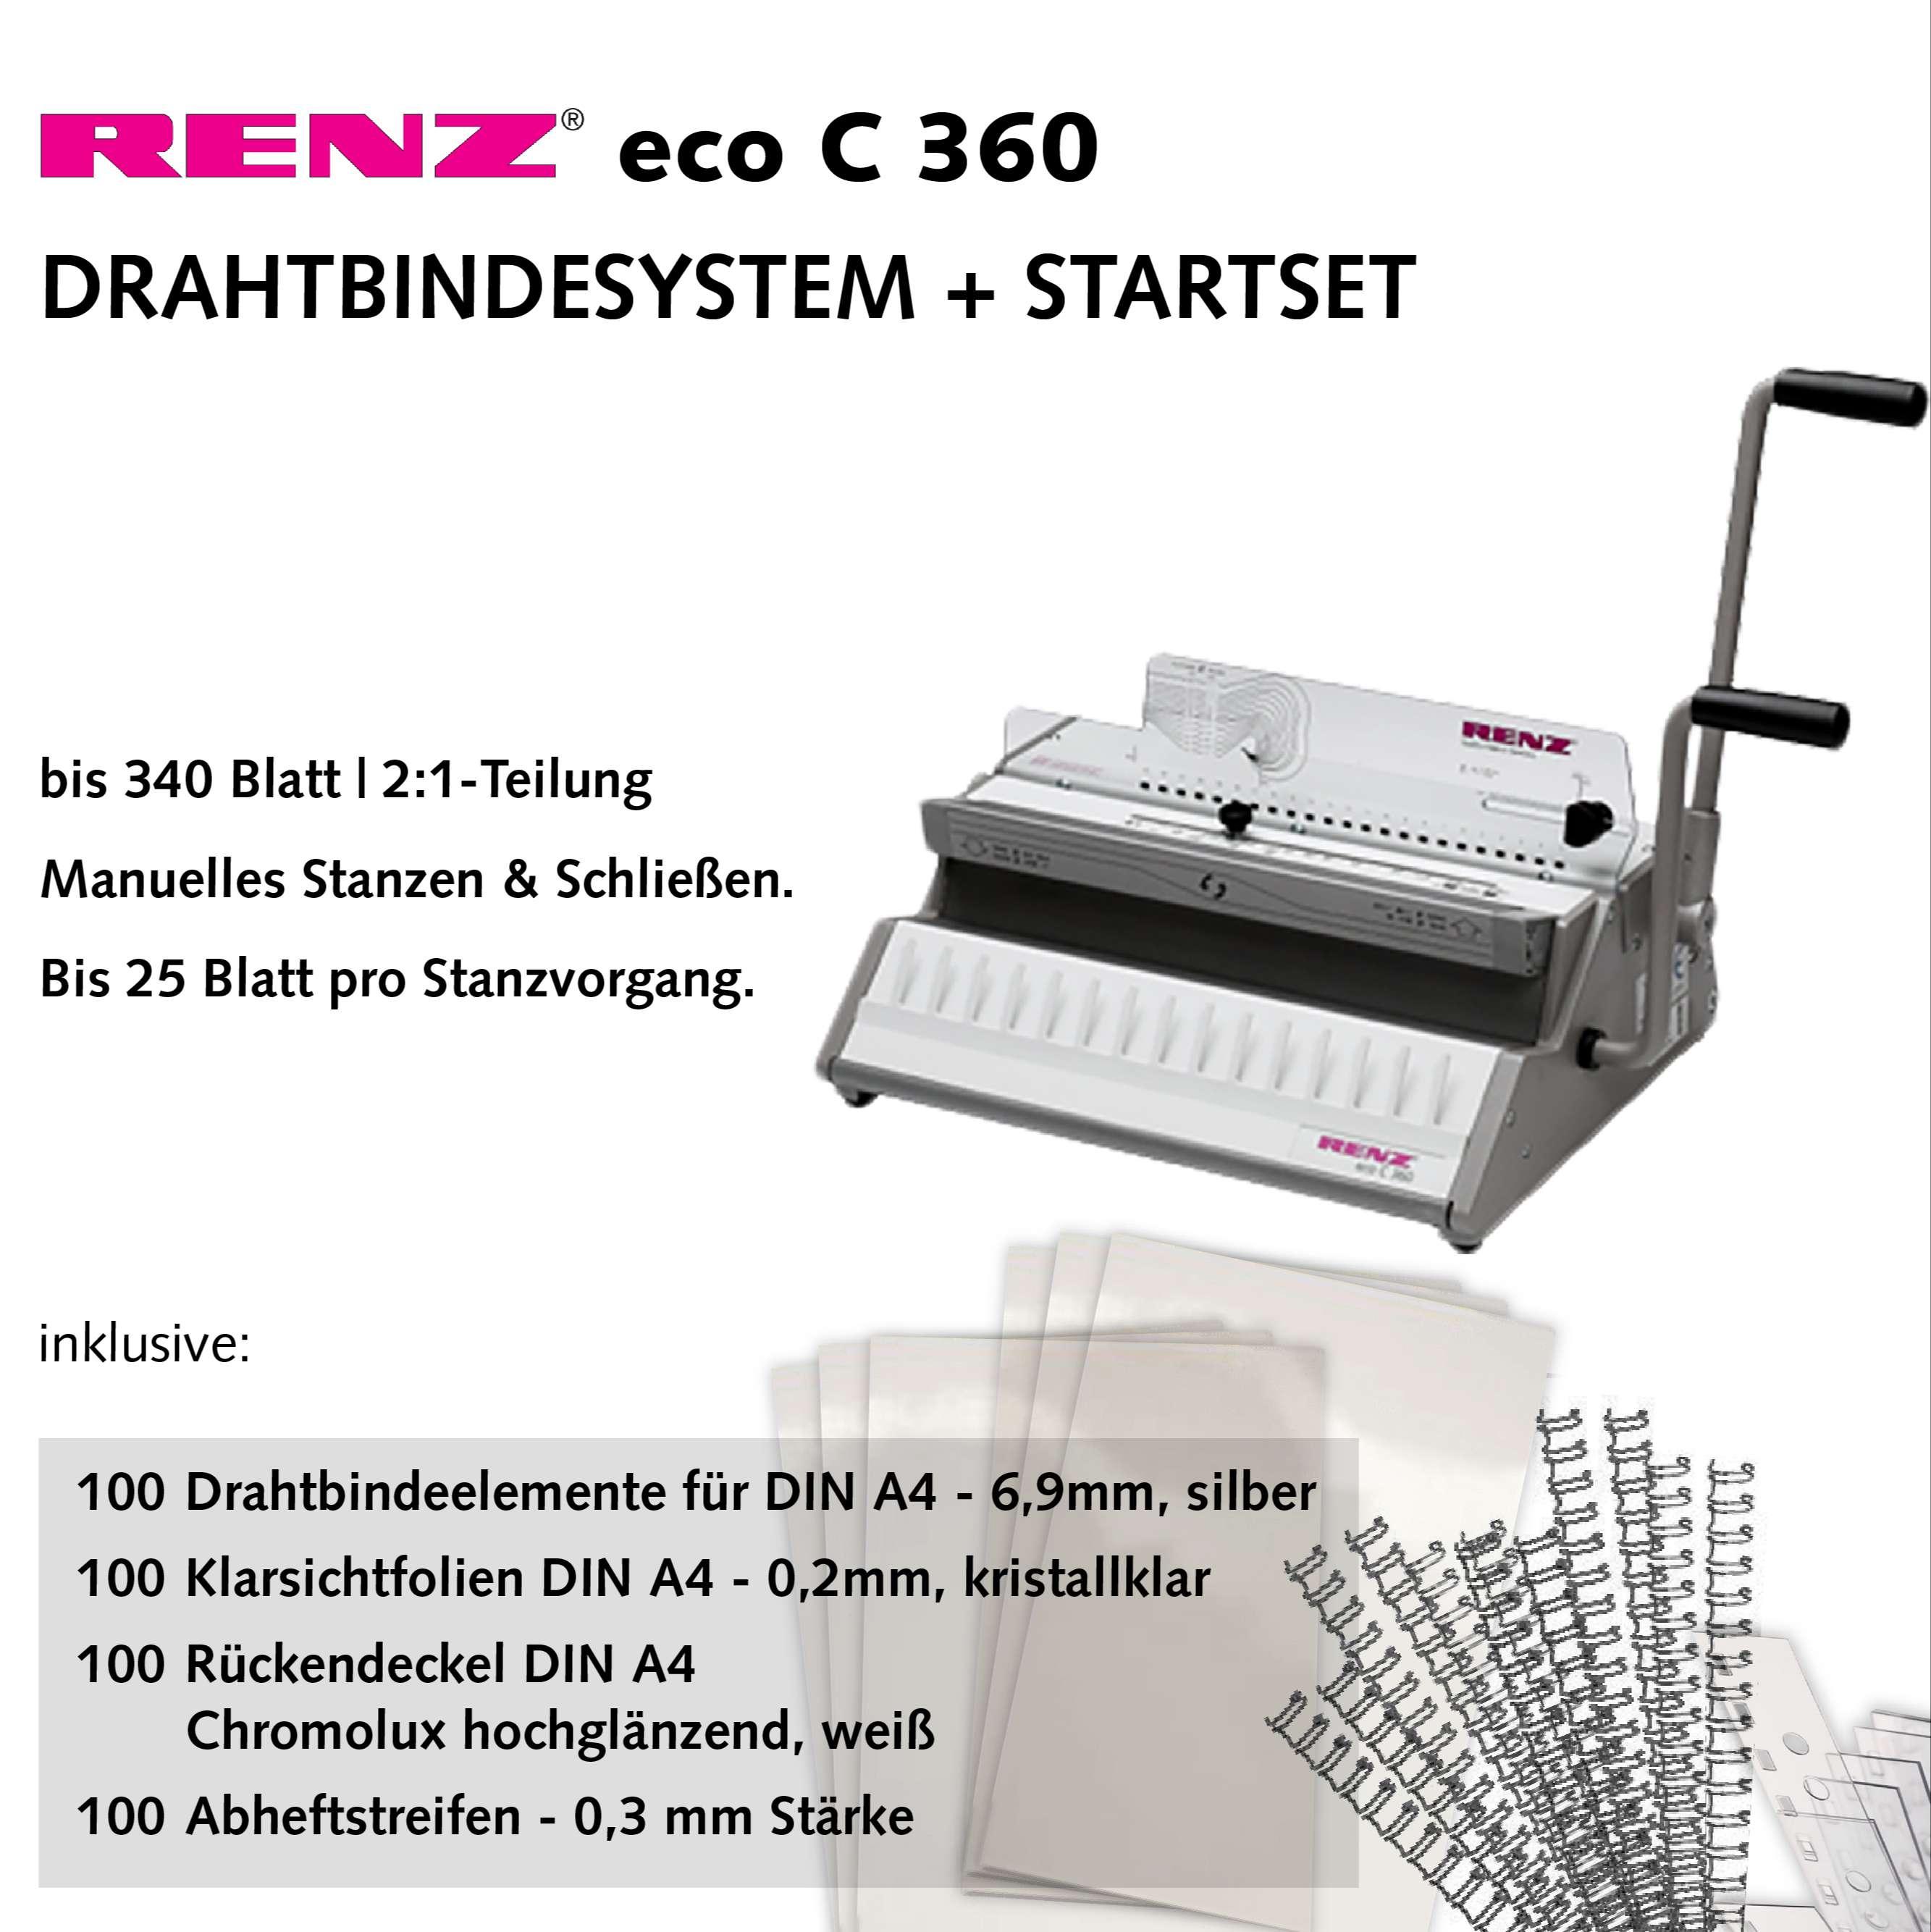 Drahtbindesystem Renz eco c360 - Startset